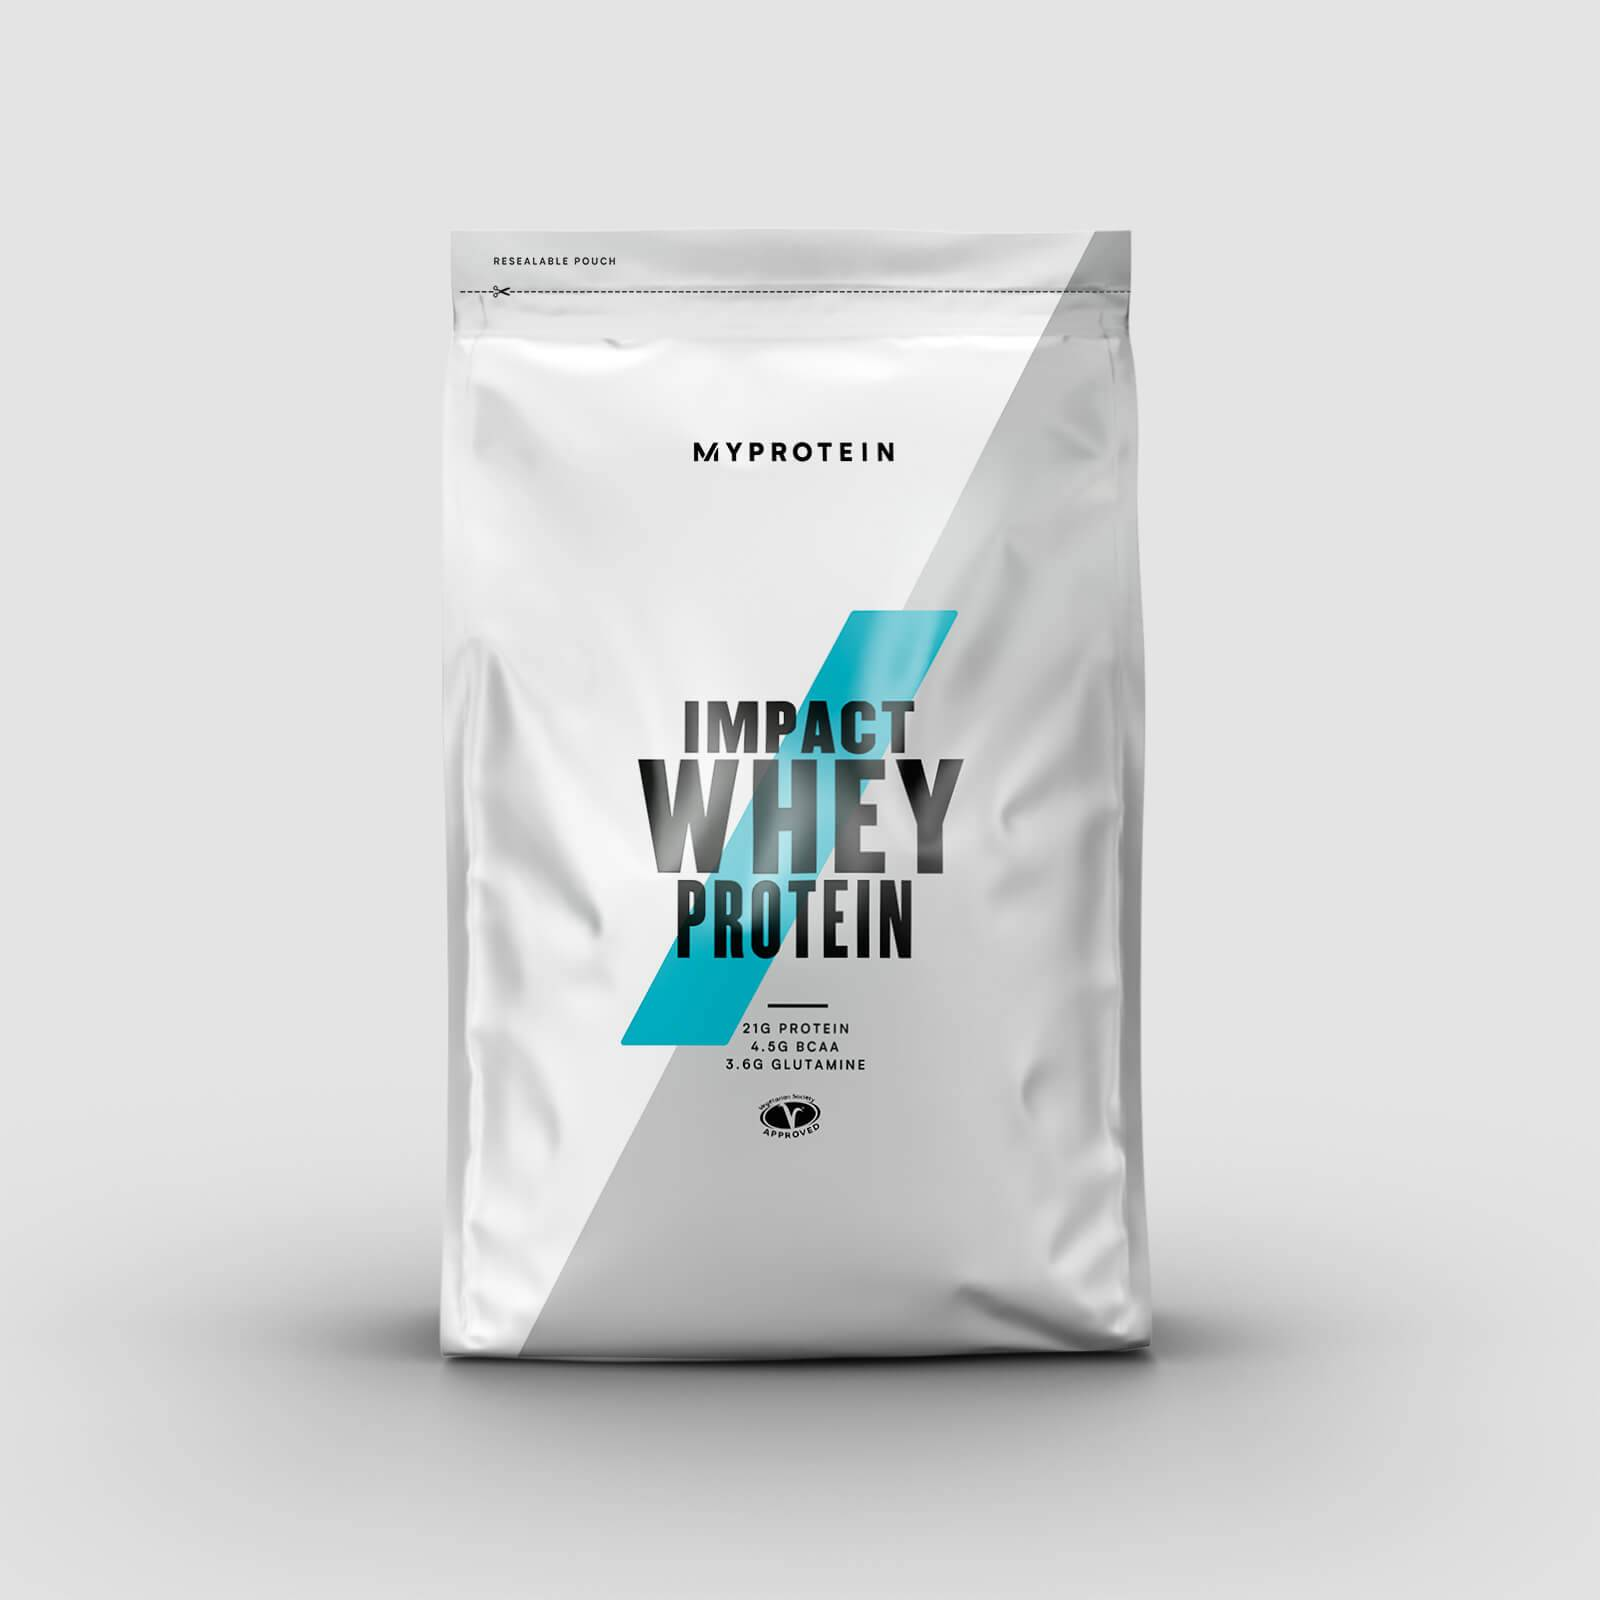 Myprotein Impact Whey Protein - 2.5kg - Gateau sauce Toffee